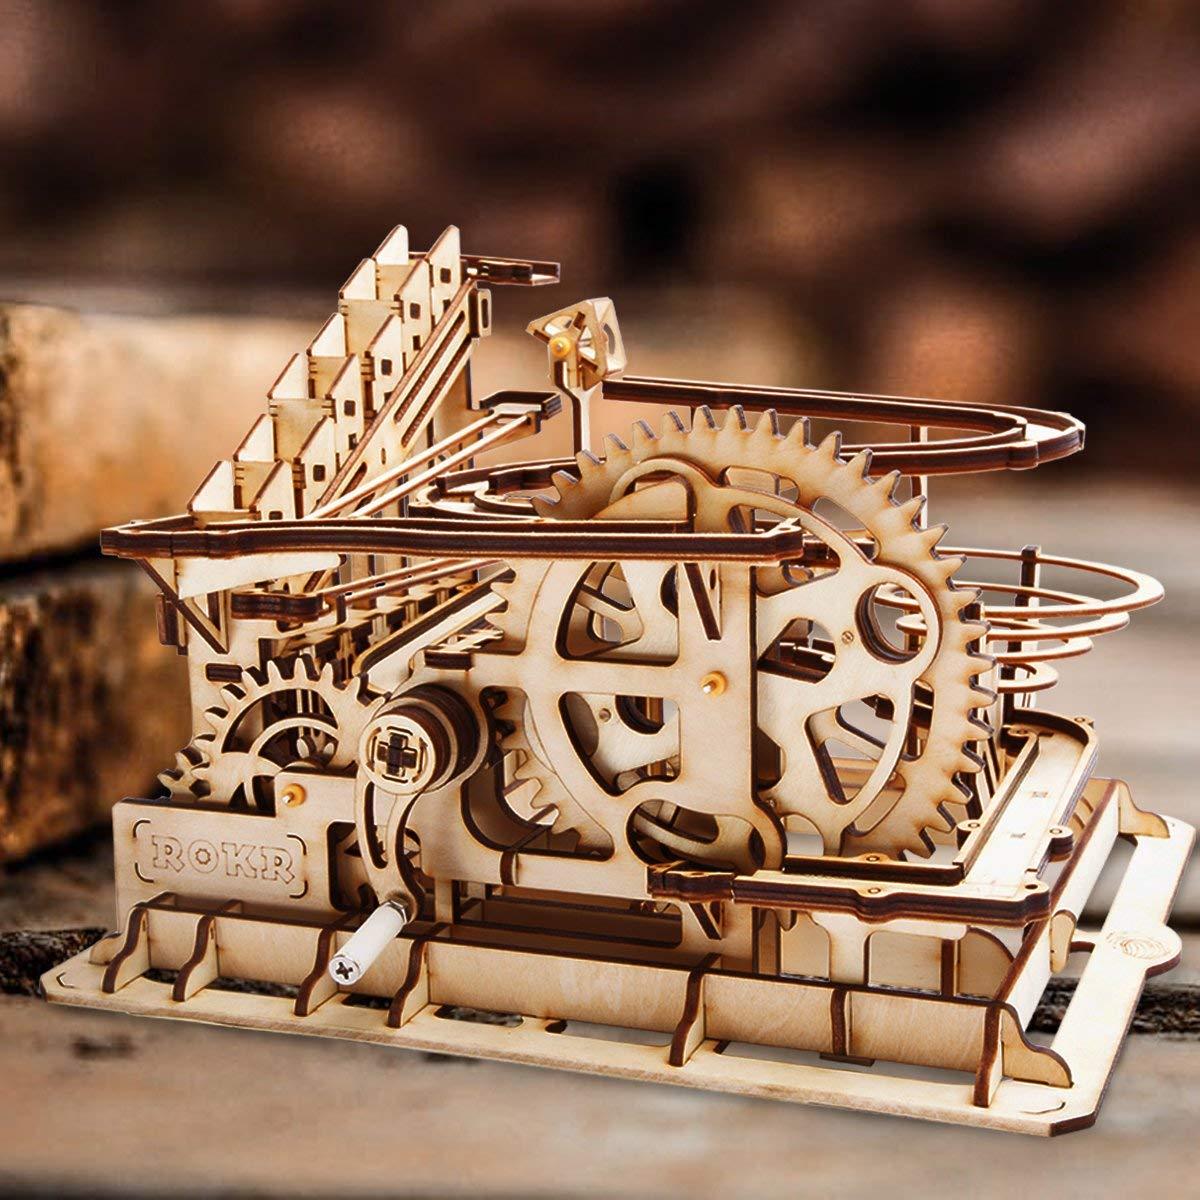 ROBOTIME DIY 3D Wooden Walking Dinosaur Puzzle Sound Control $12; Dollhouse Wooden Miniature Furniture Kit Mini Green House with LED $24.49; Waterwheel Coaster w/Steel Balls $29.66